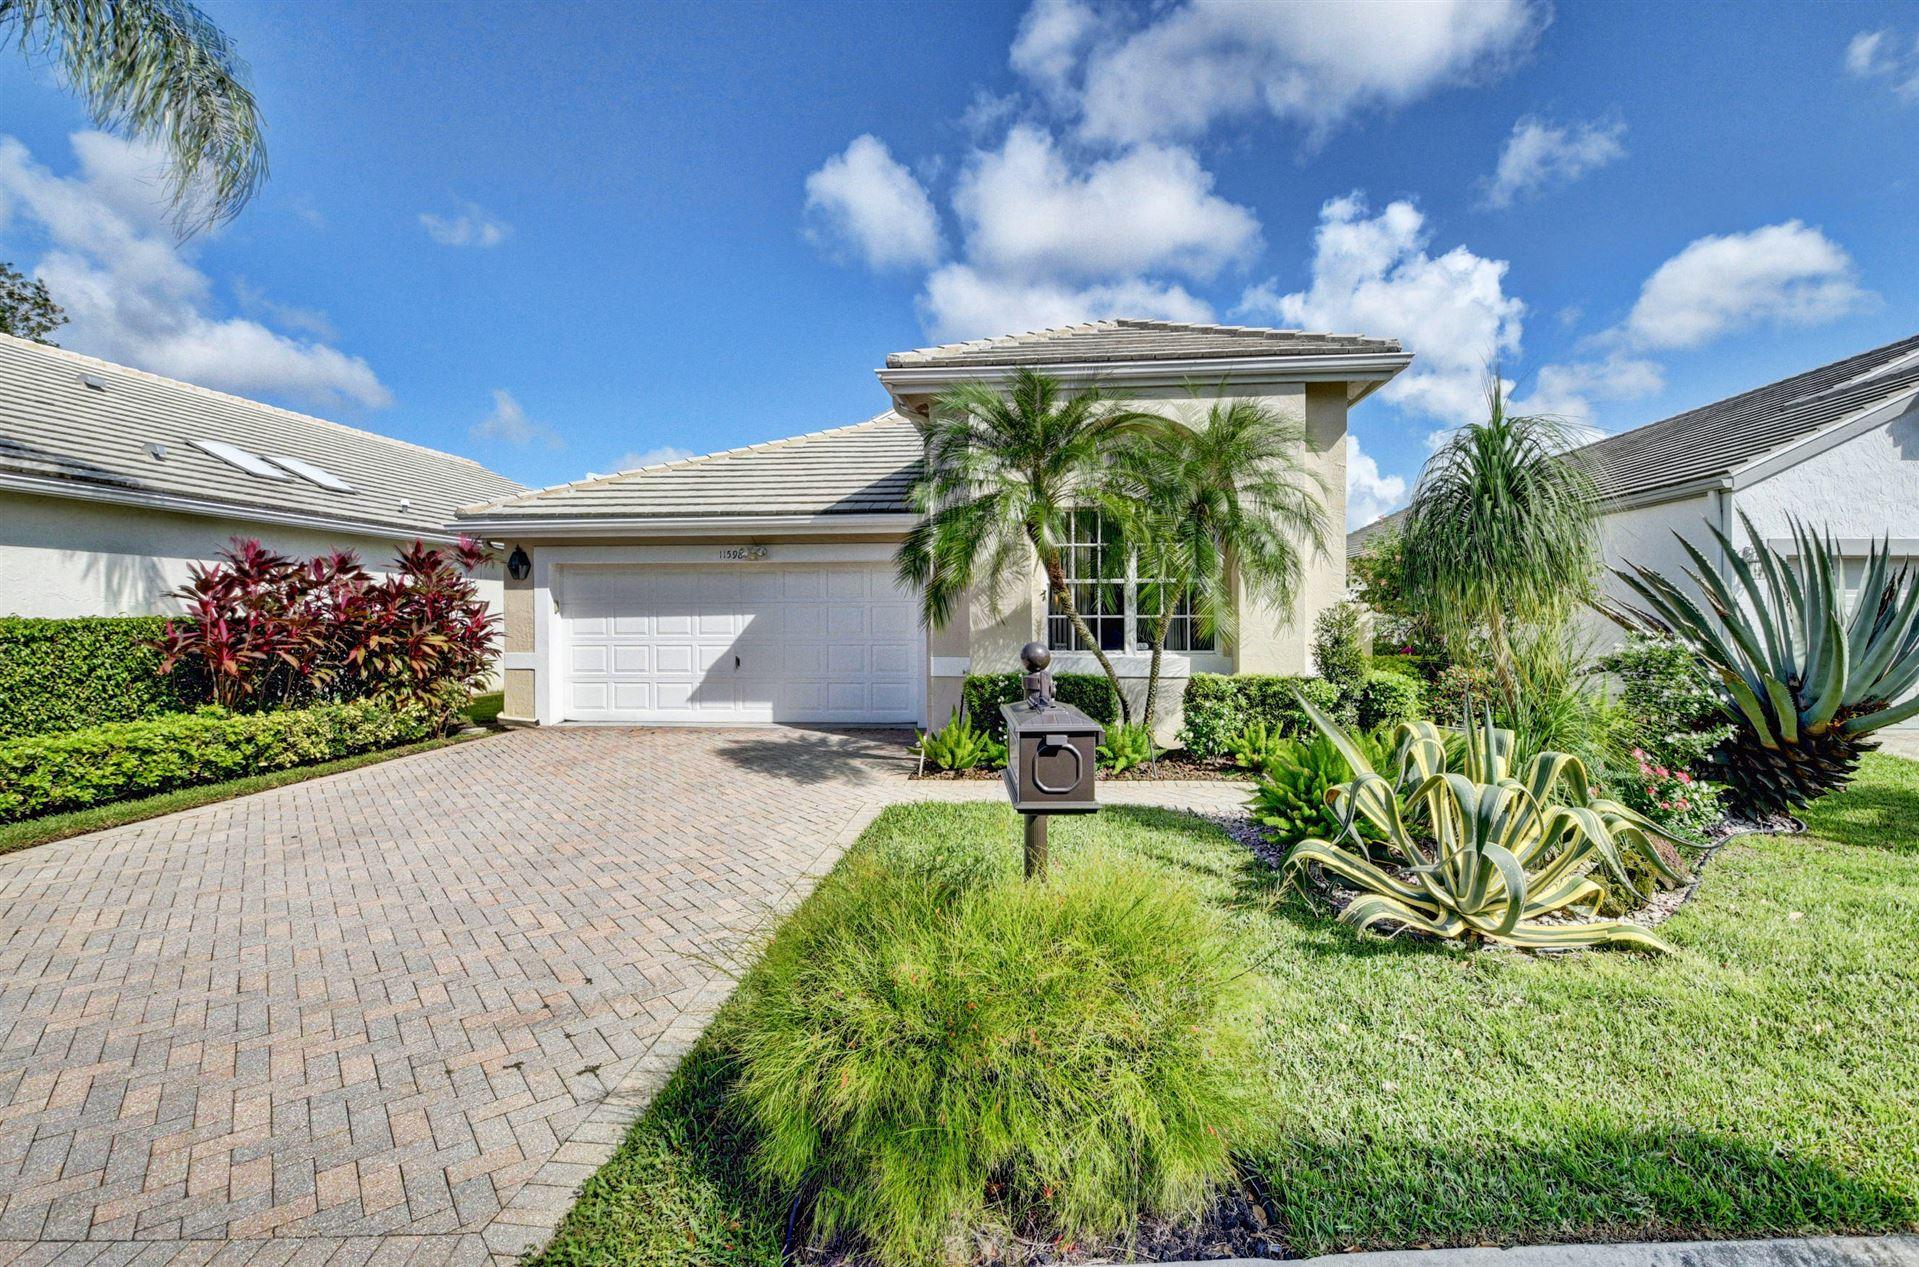 11598 Creekside Drive, Boynton Beach, FL 33437 - #: RX-10654147